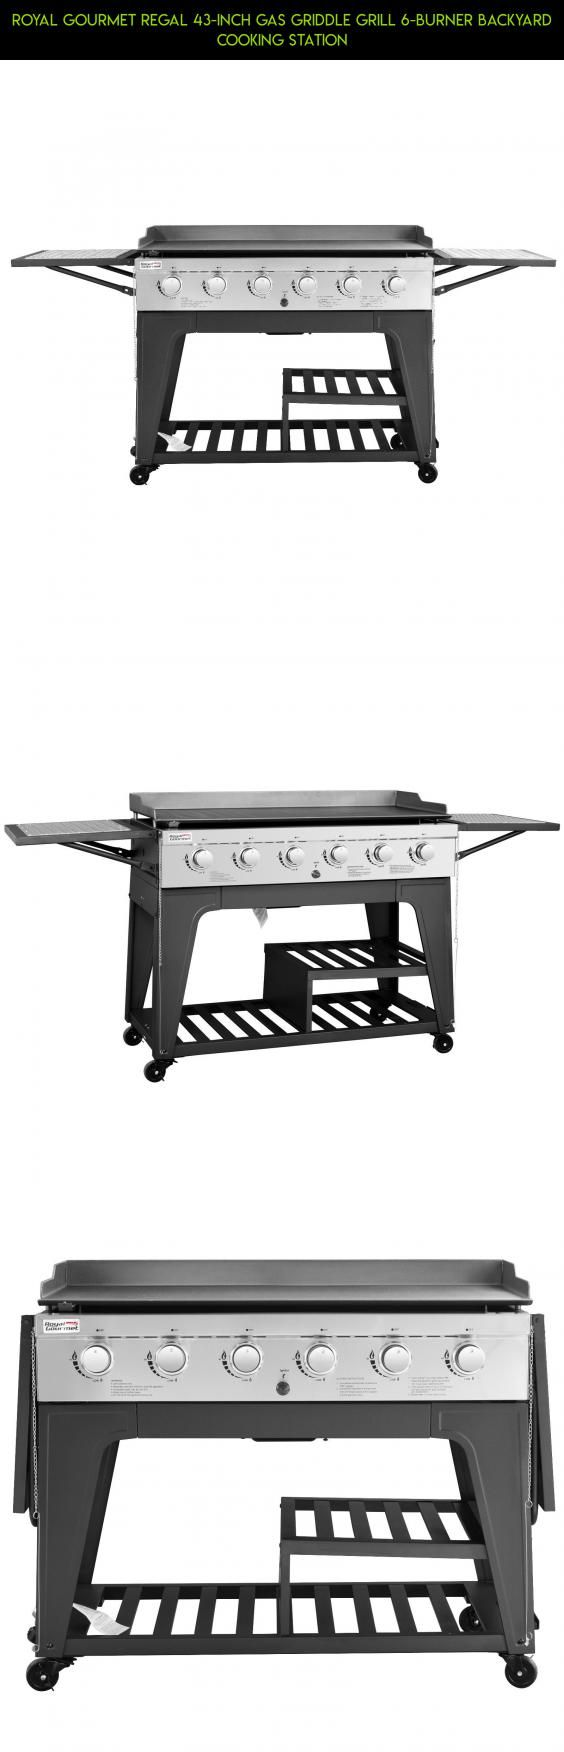 best 25 6 burner bbq ideas on pinterest built in outdoor grill